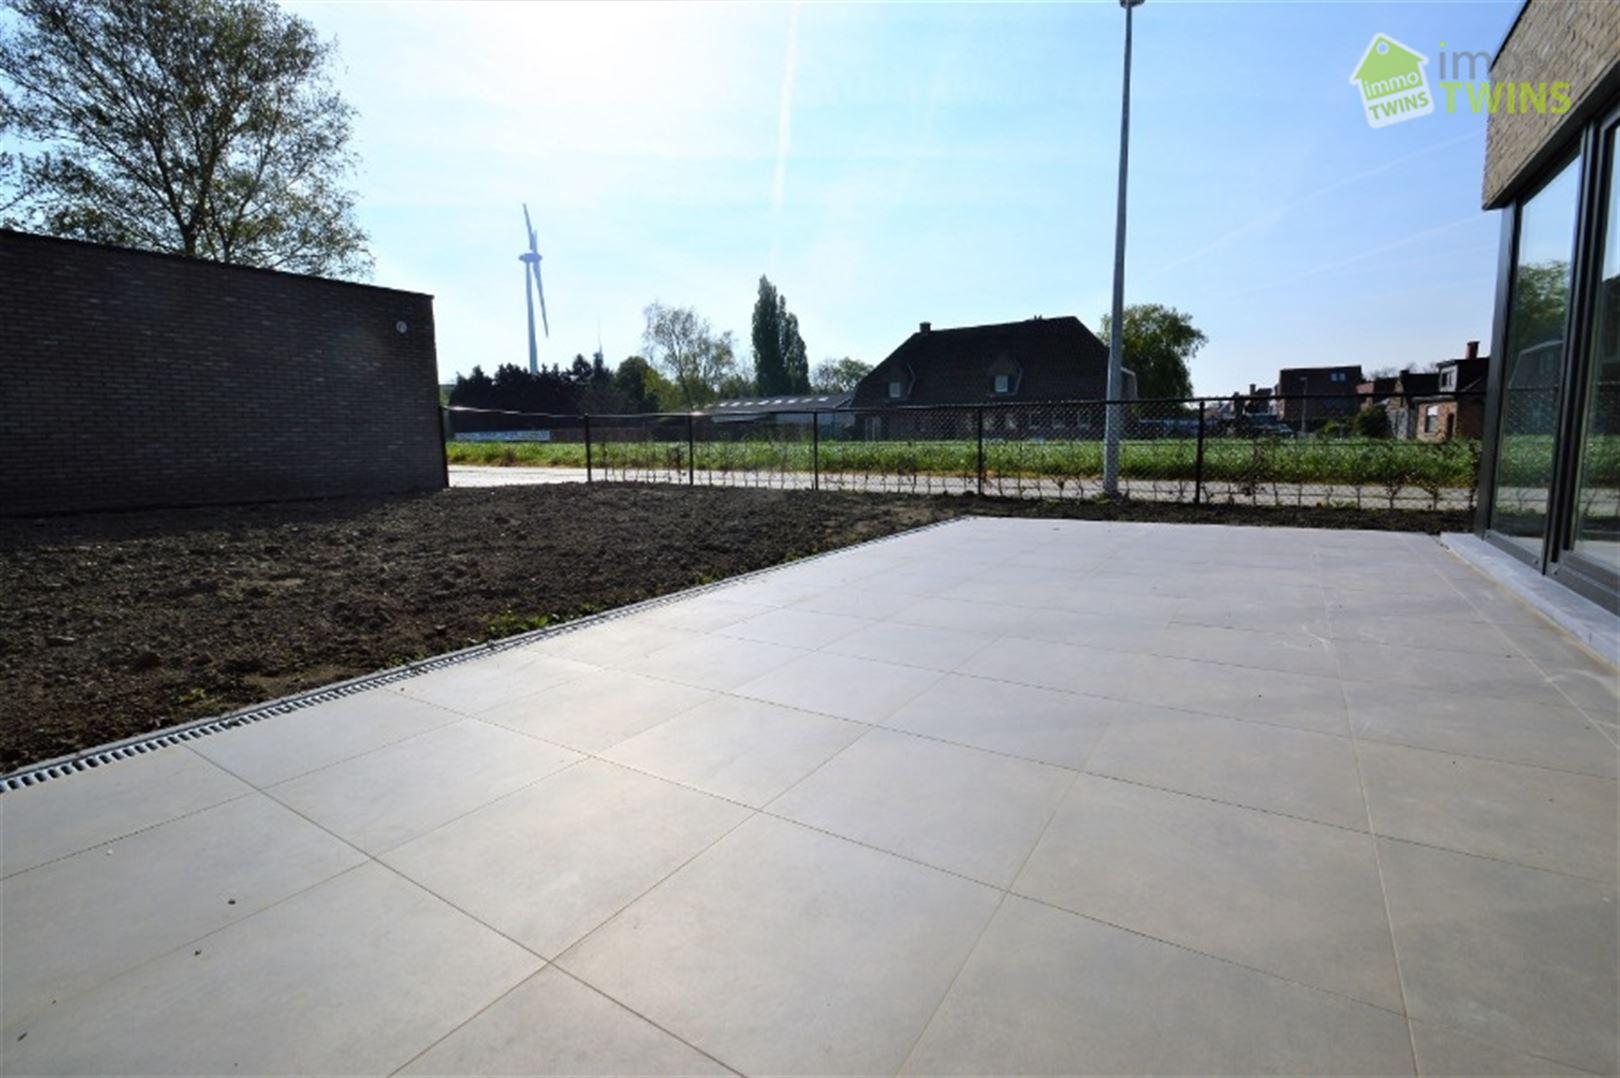 Foto 3 : Woning te 9200 Sint-Gillis-bij-Dendermonde (België) - Prijs € 999